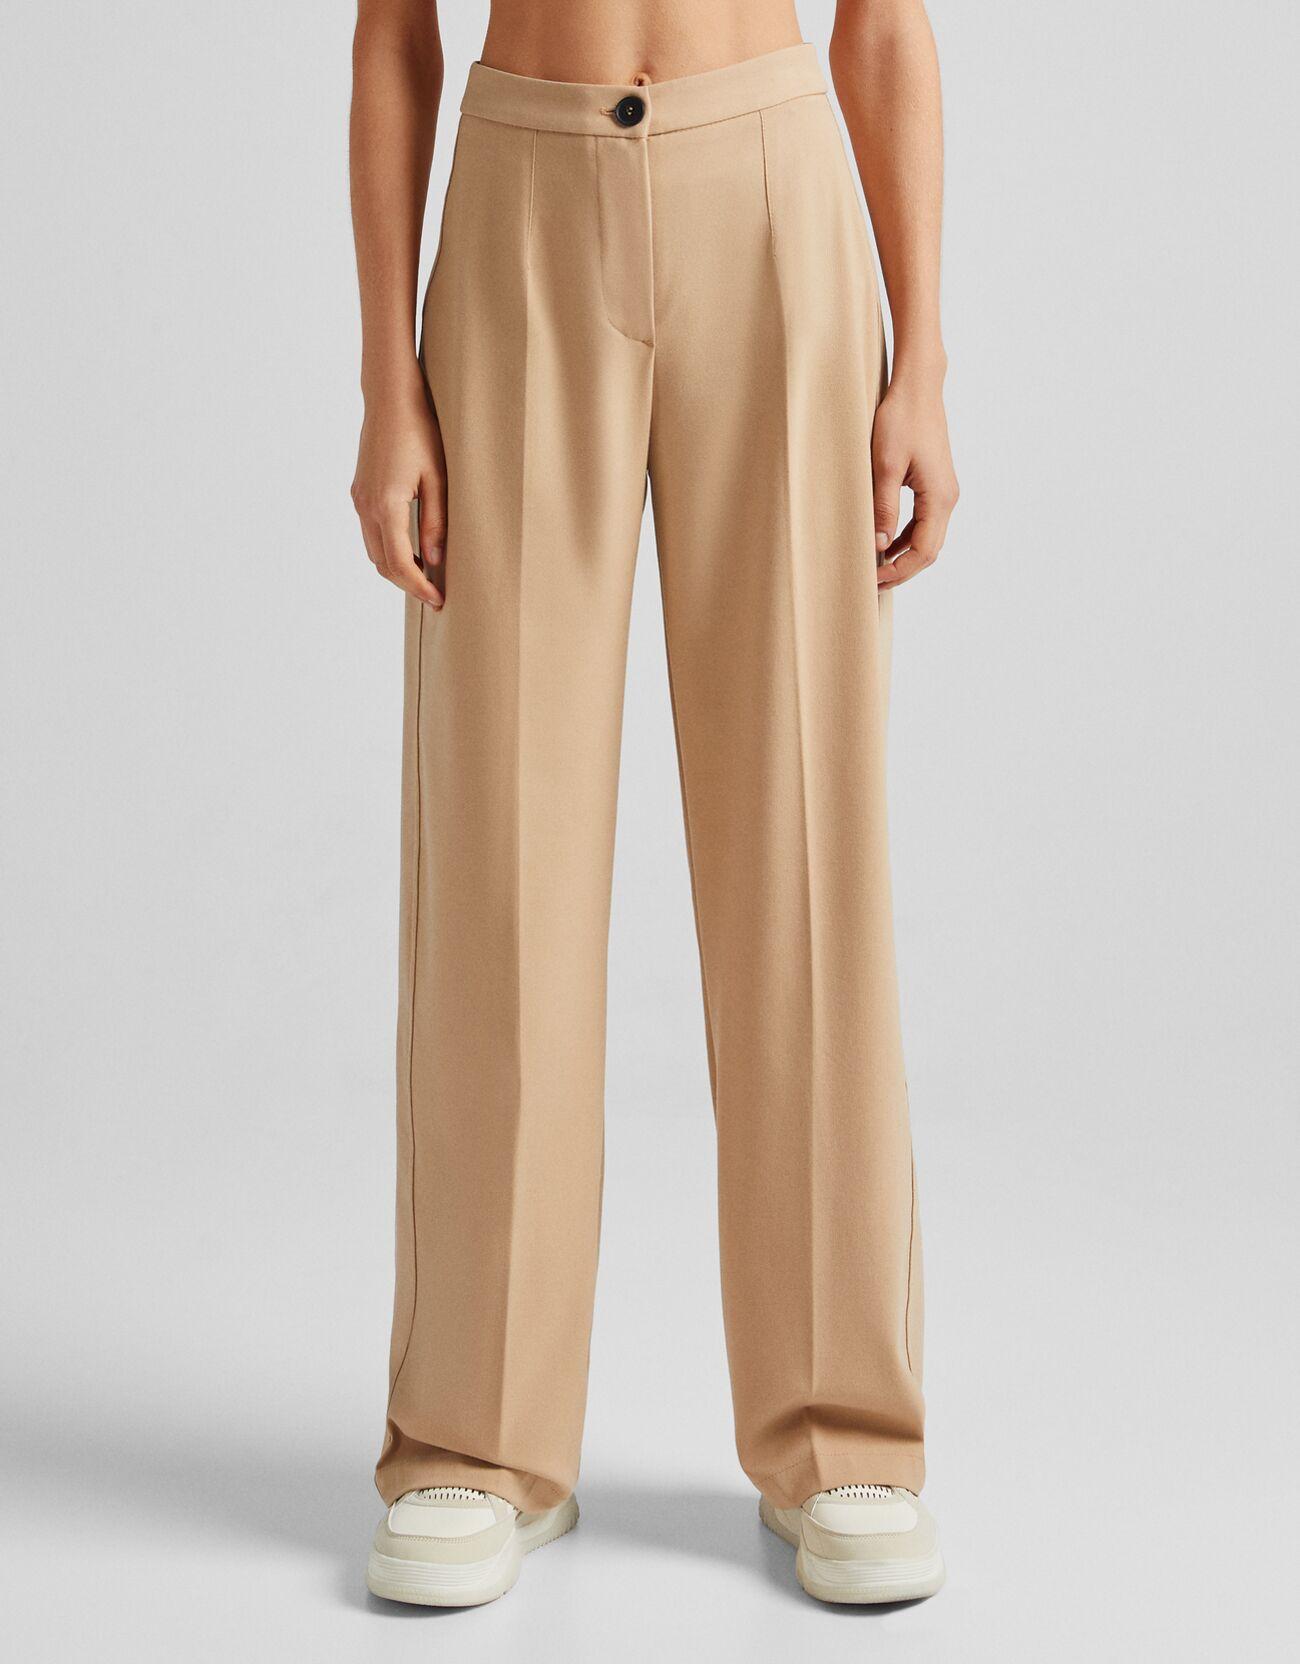 Bershka Pantalón Wide Leg Bolsillo Trasero Mujer 32 Camel